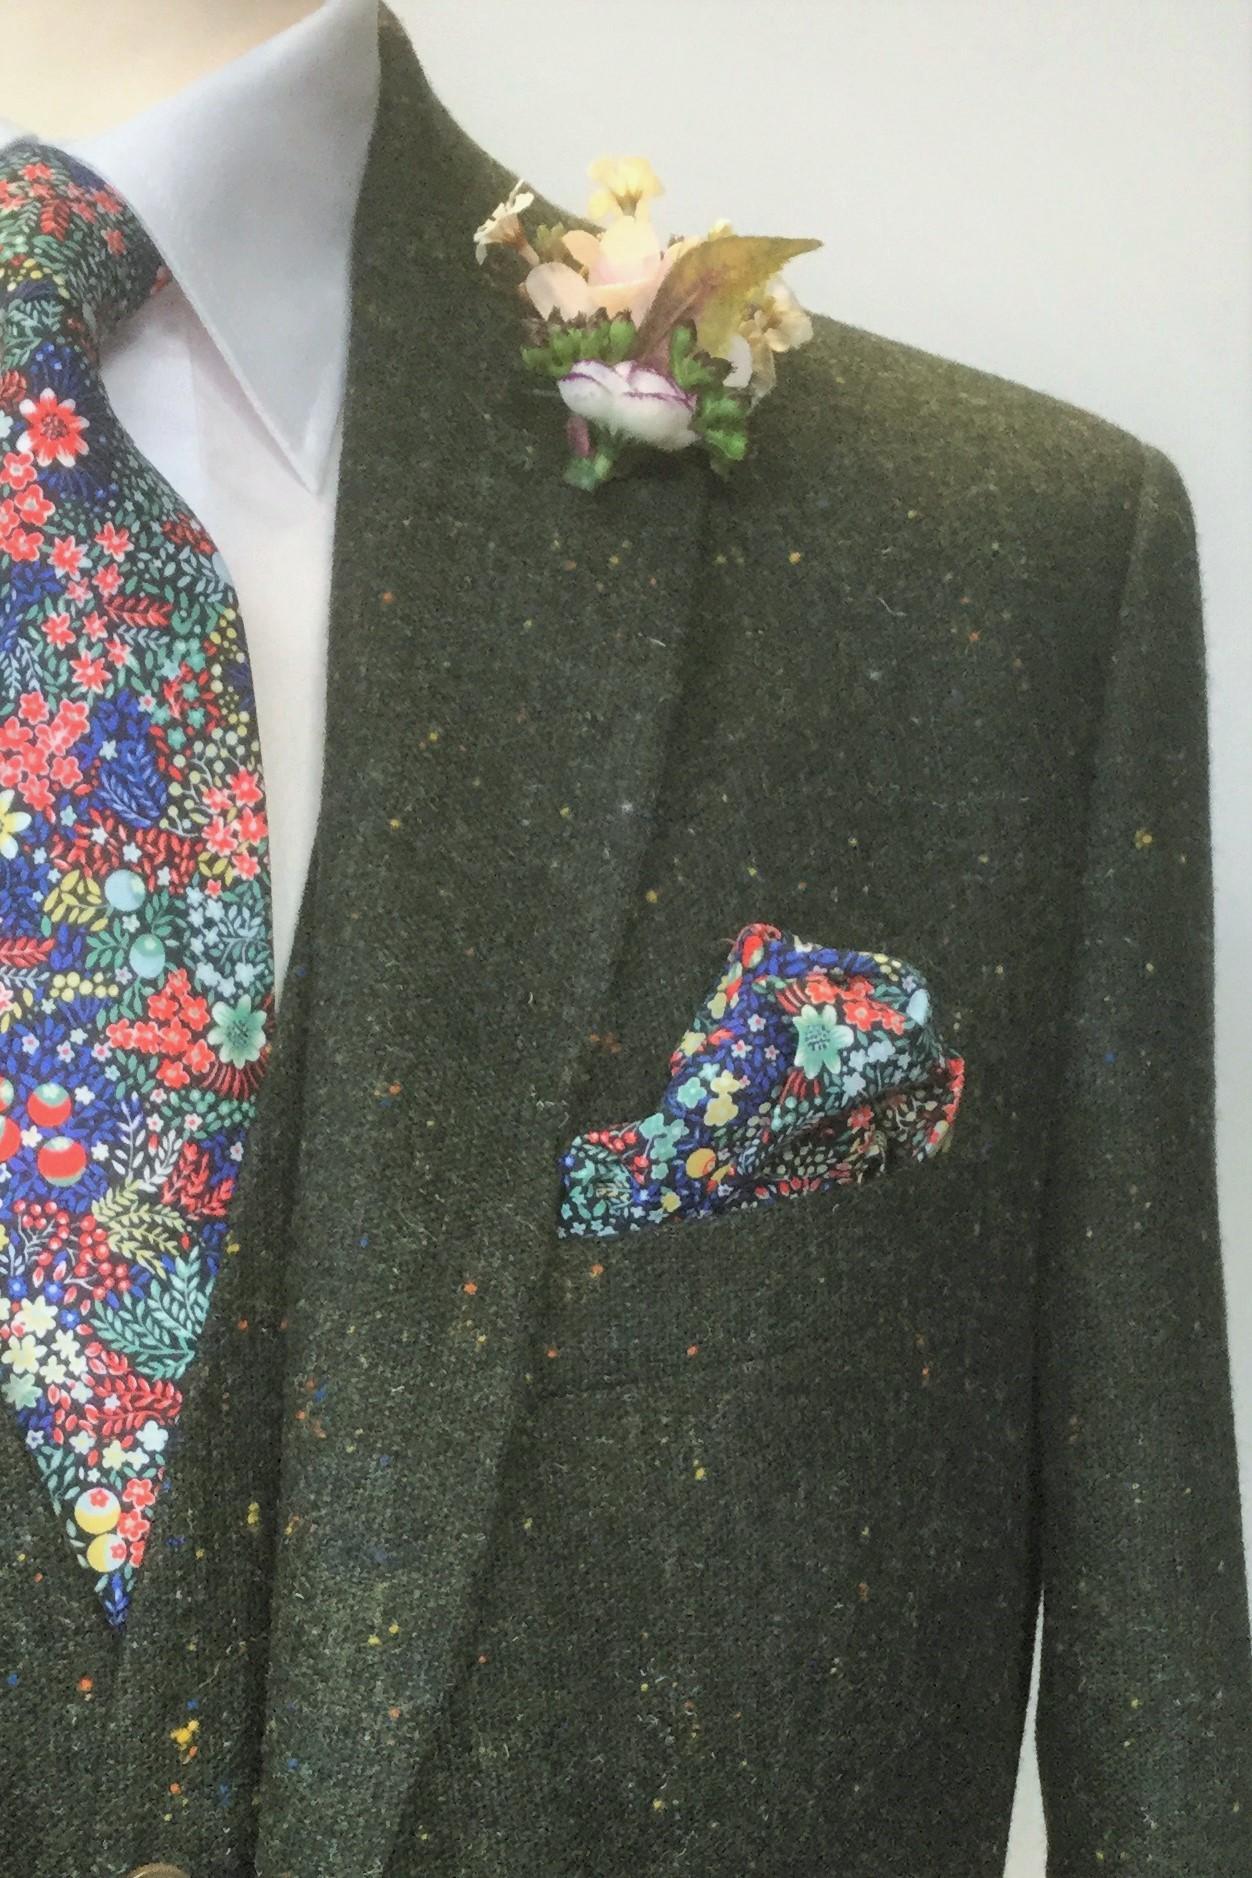 Green Tweed Mens Wedding Suit with Liberty fabric tie